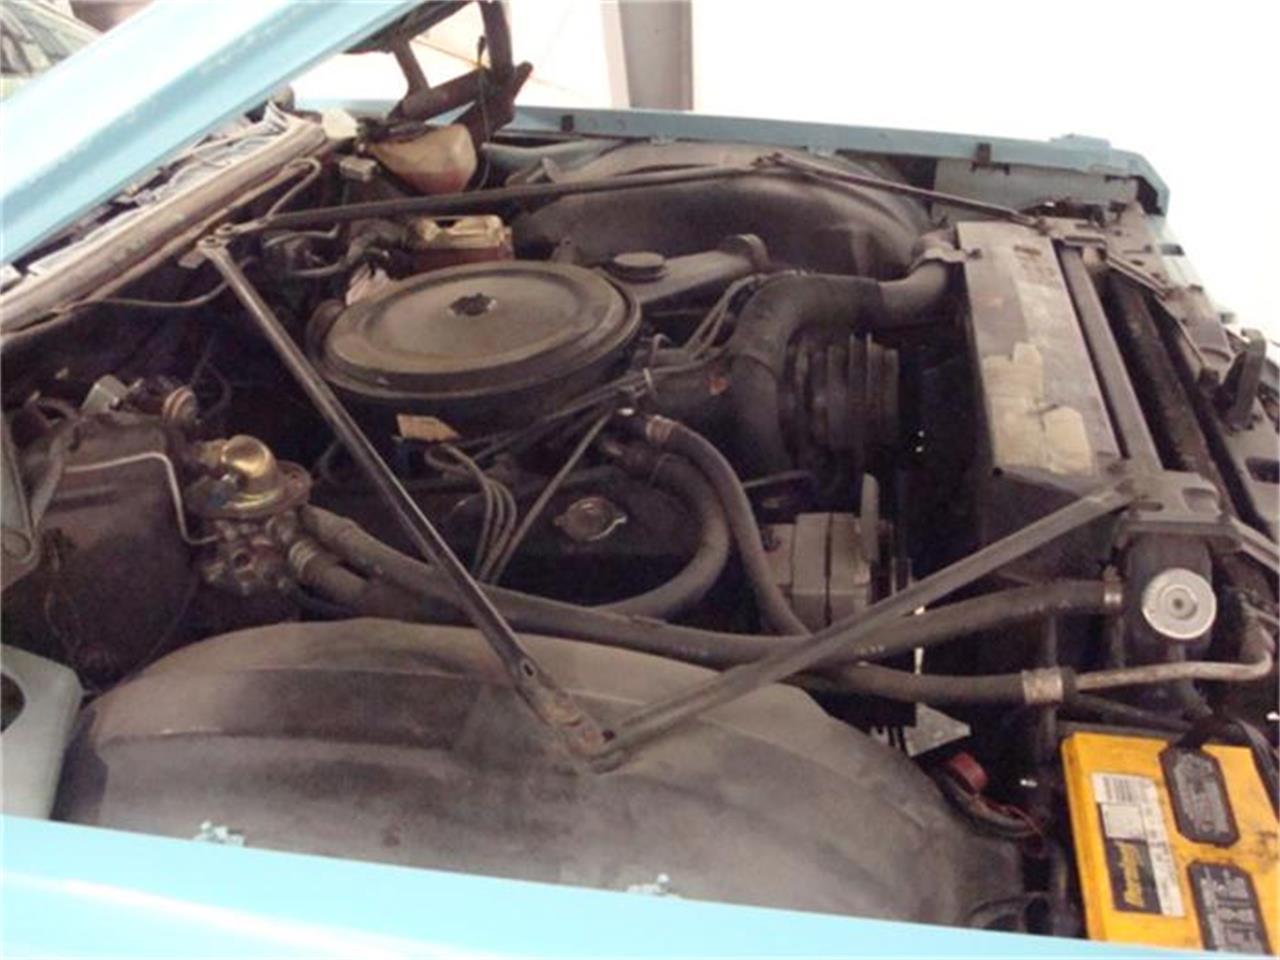 1975 Cadillac Coupe DeVille for sale in Lillington, NC ...